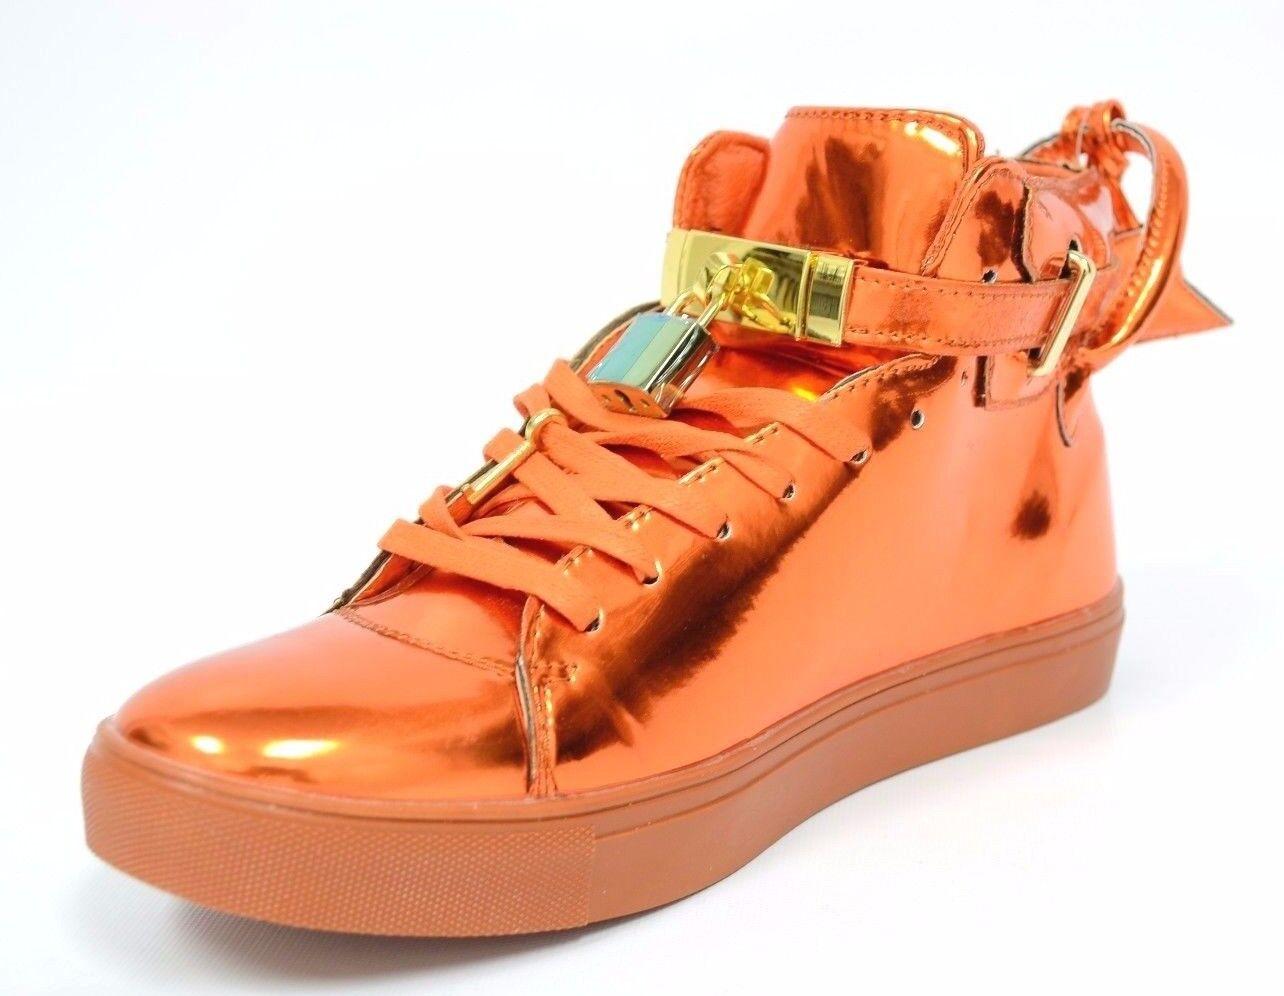 Scarpe casual da uomo  uomos Fiesso Orange Sneakers High Top Boots by Aurelio Garcia Sneakers FI2247